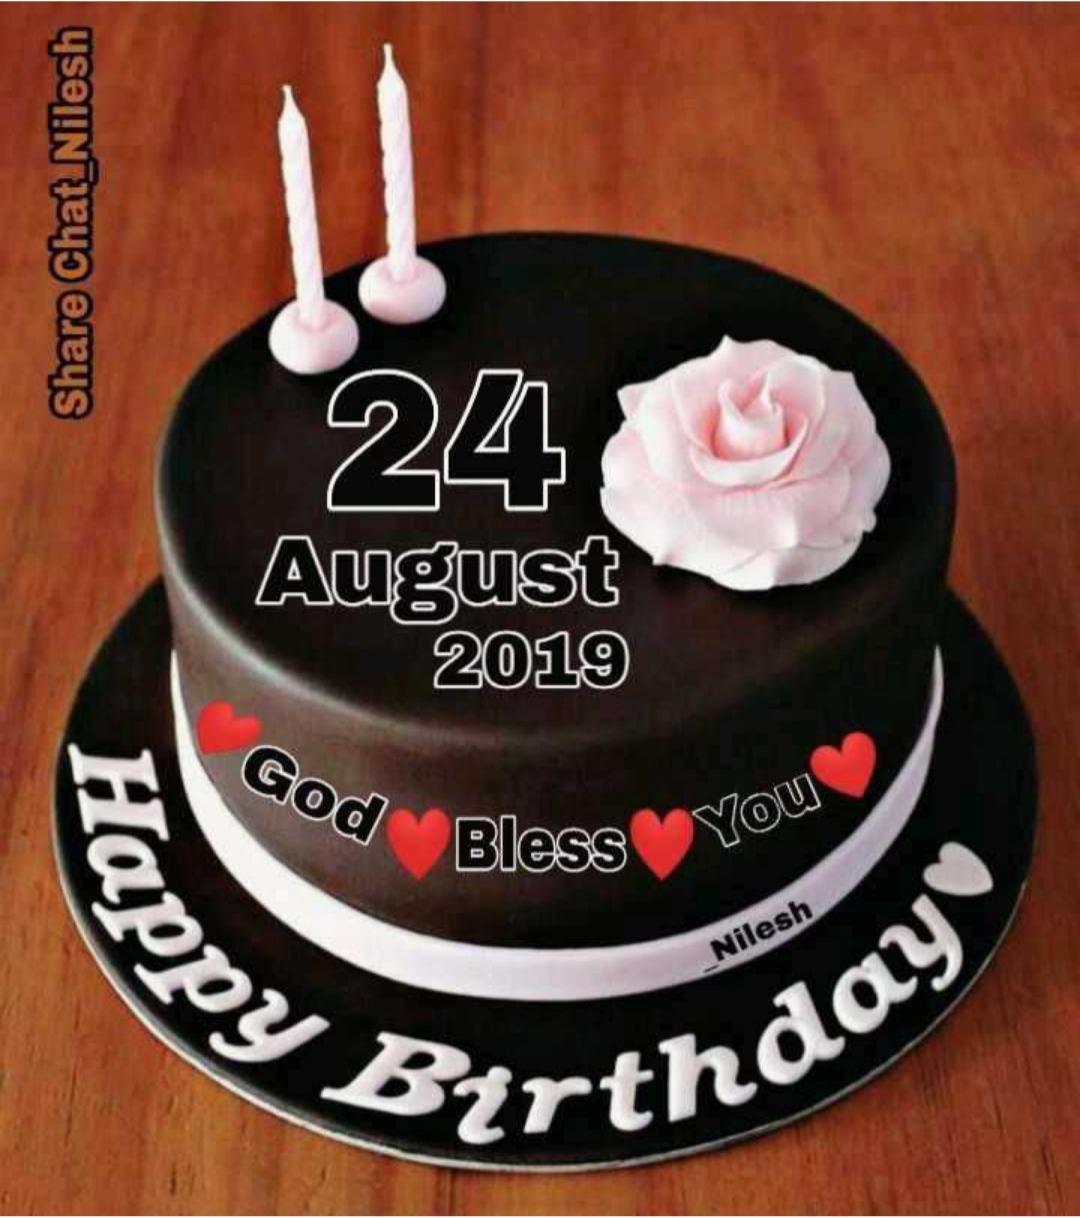 🎂हॅपी बर्थडे - Share Chat _ Nilesh 24 August 2019 God Bless Ss You _ Nilesh kappy & Birtno hday - ShareChat